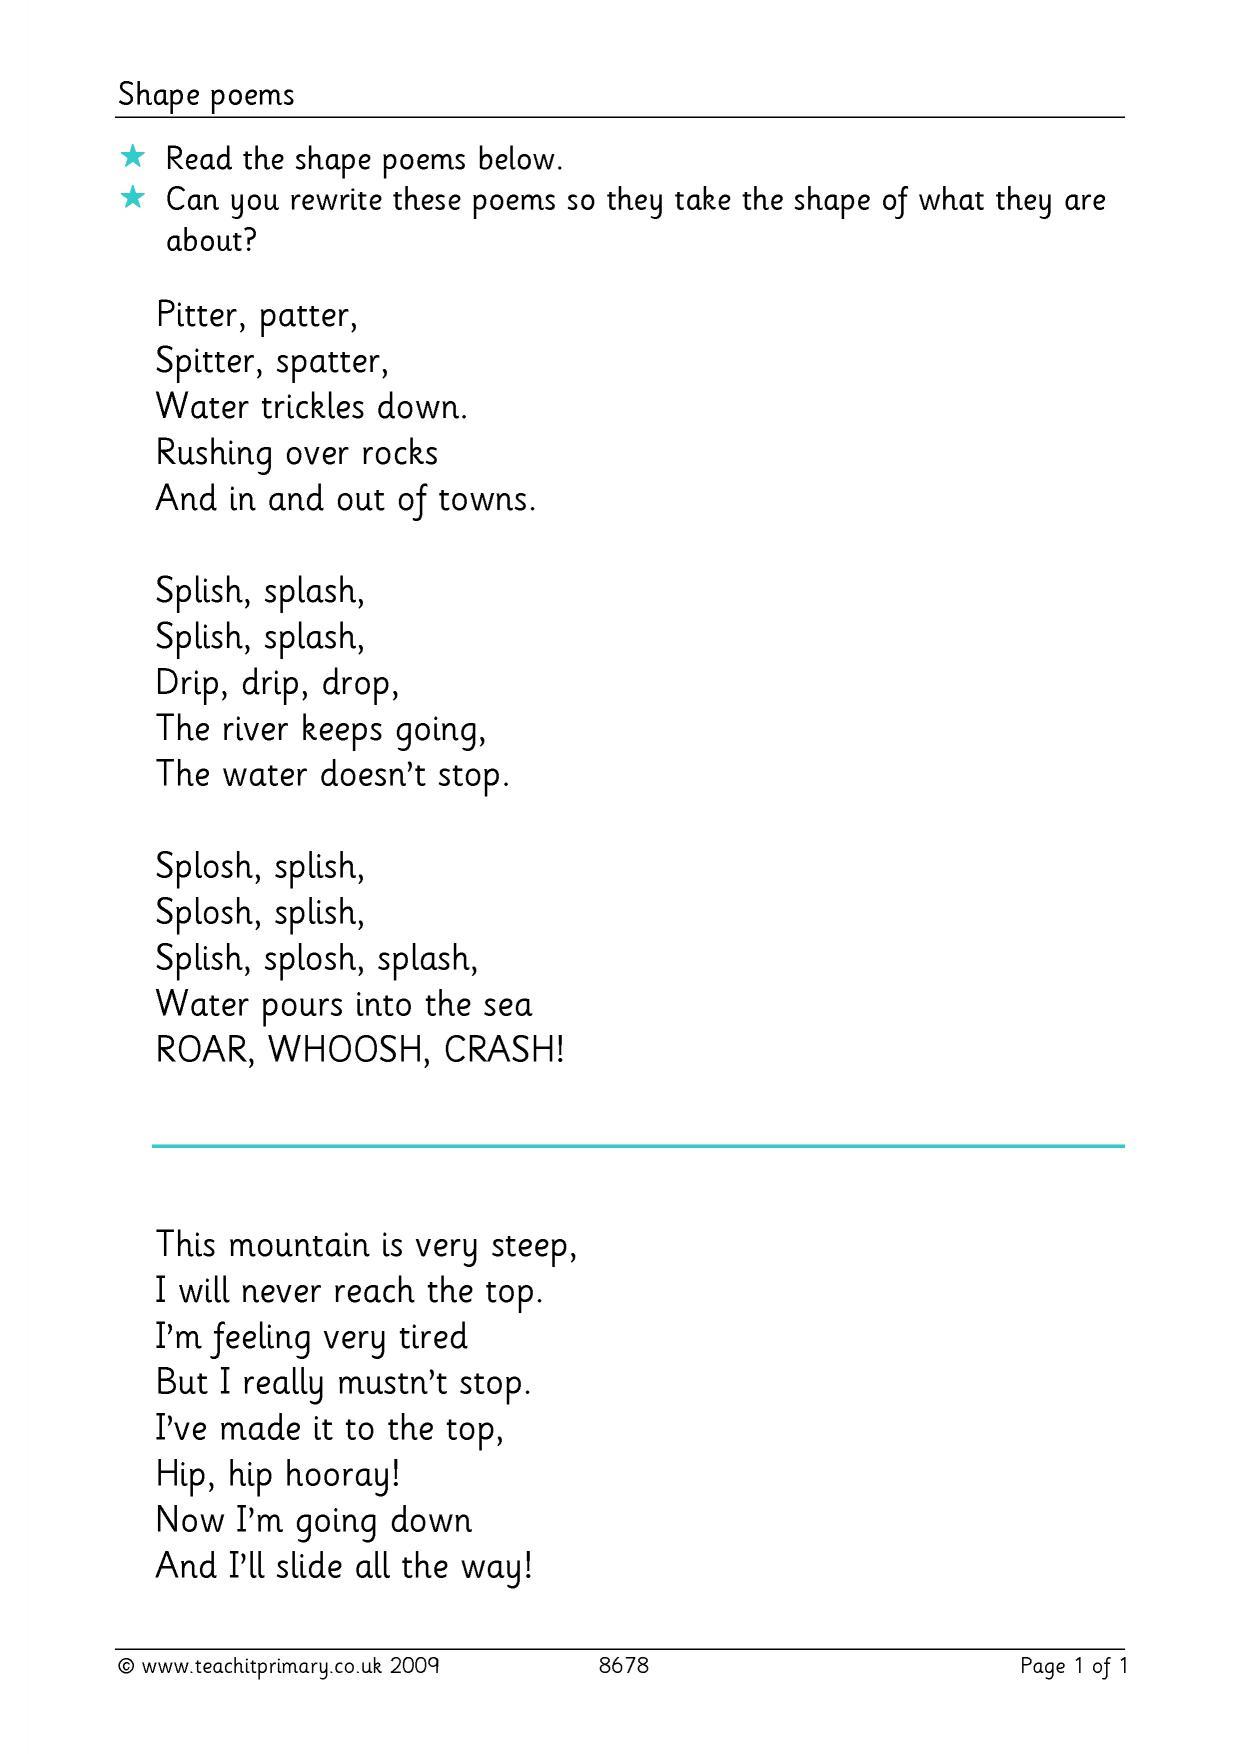 Shape Poem Worksheet